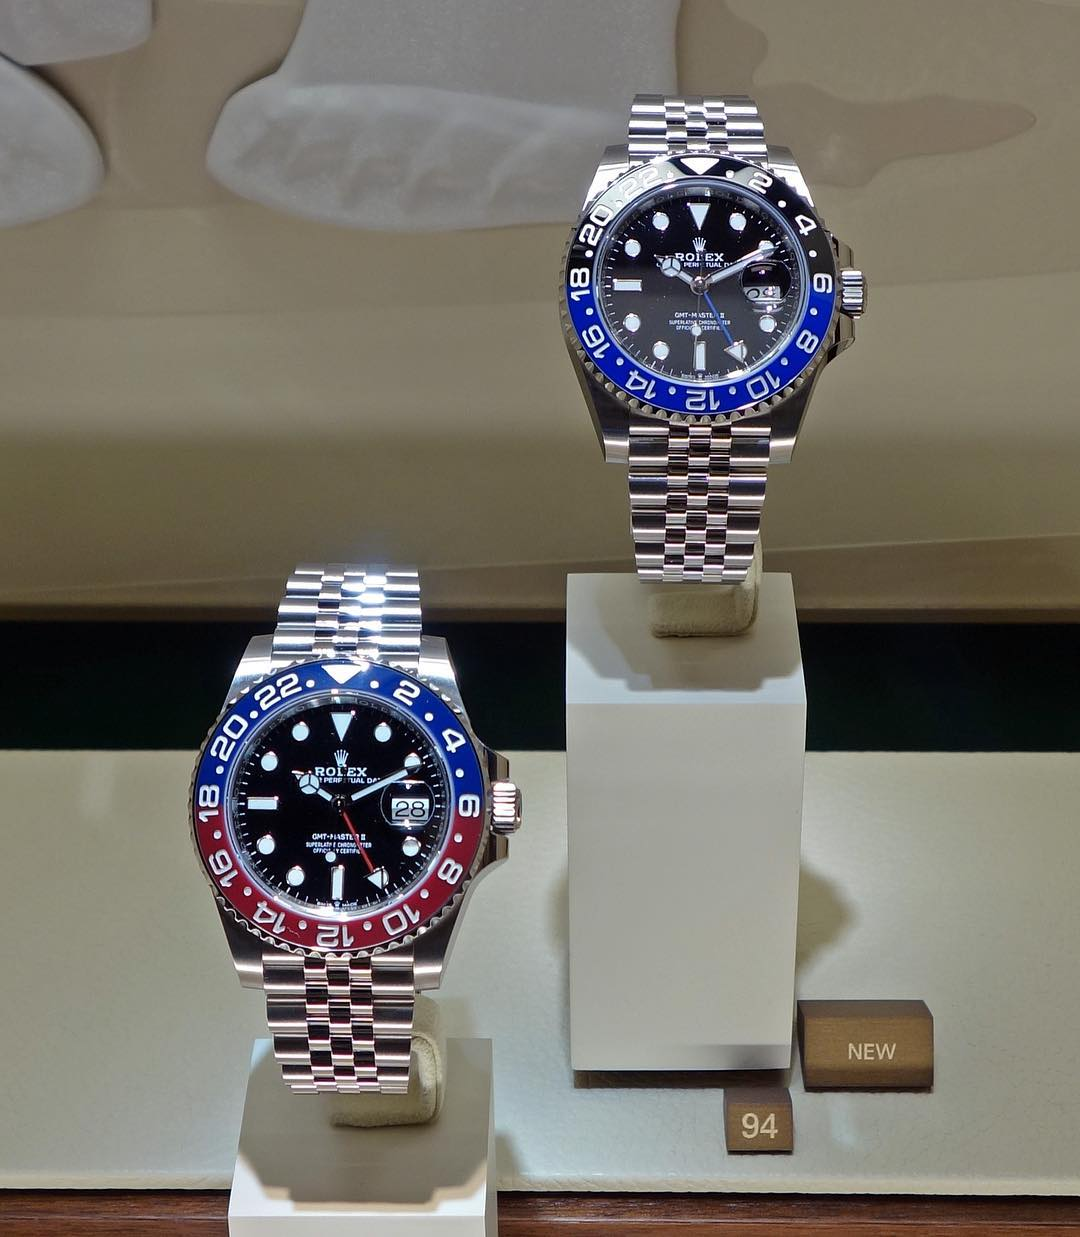 Rolex GMT-Master II Ref. 126710BLRO & 126710BLNR